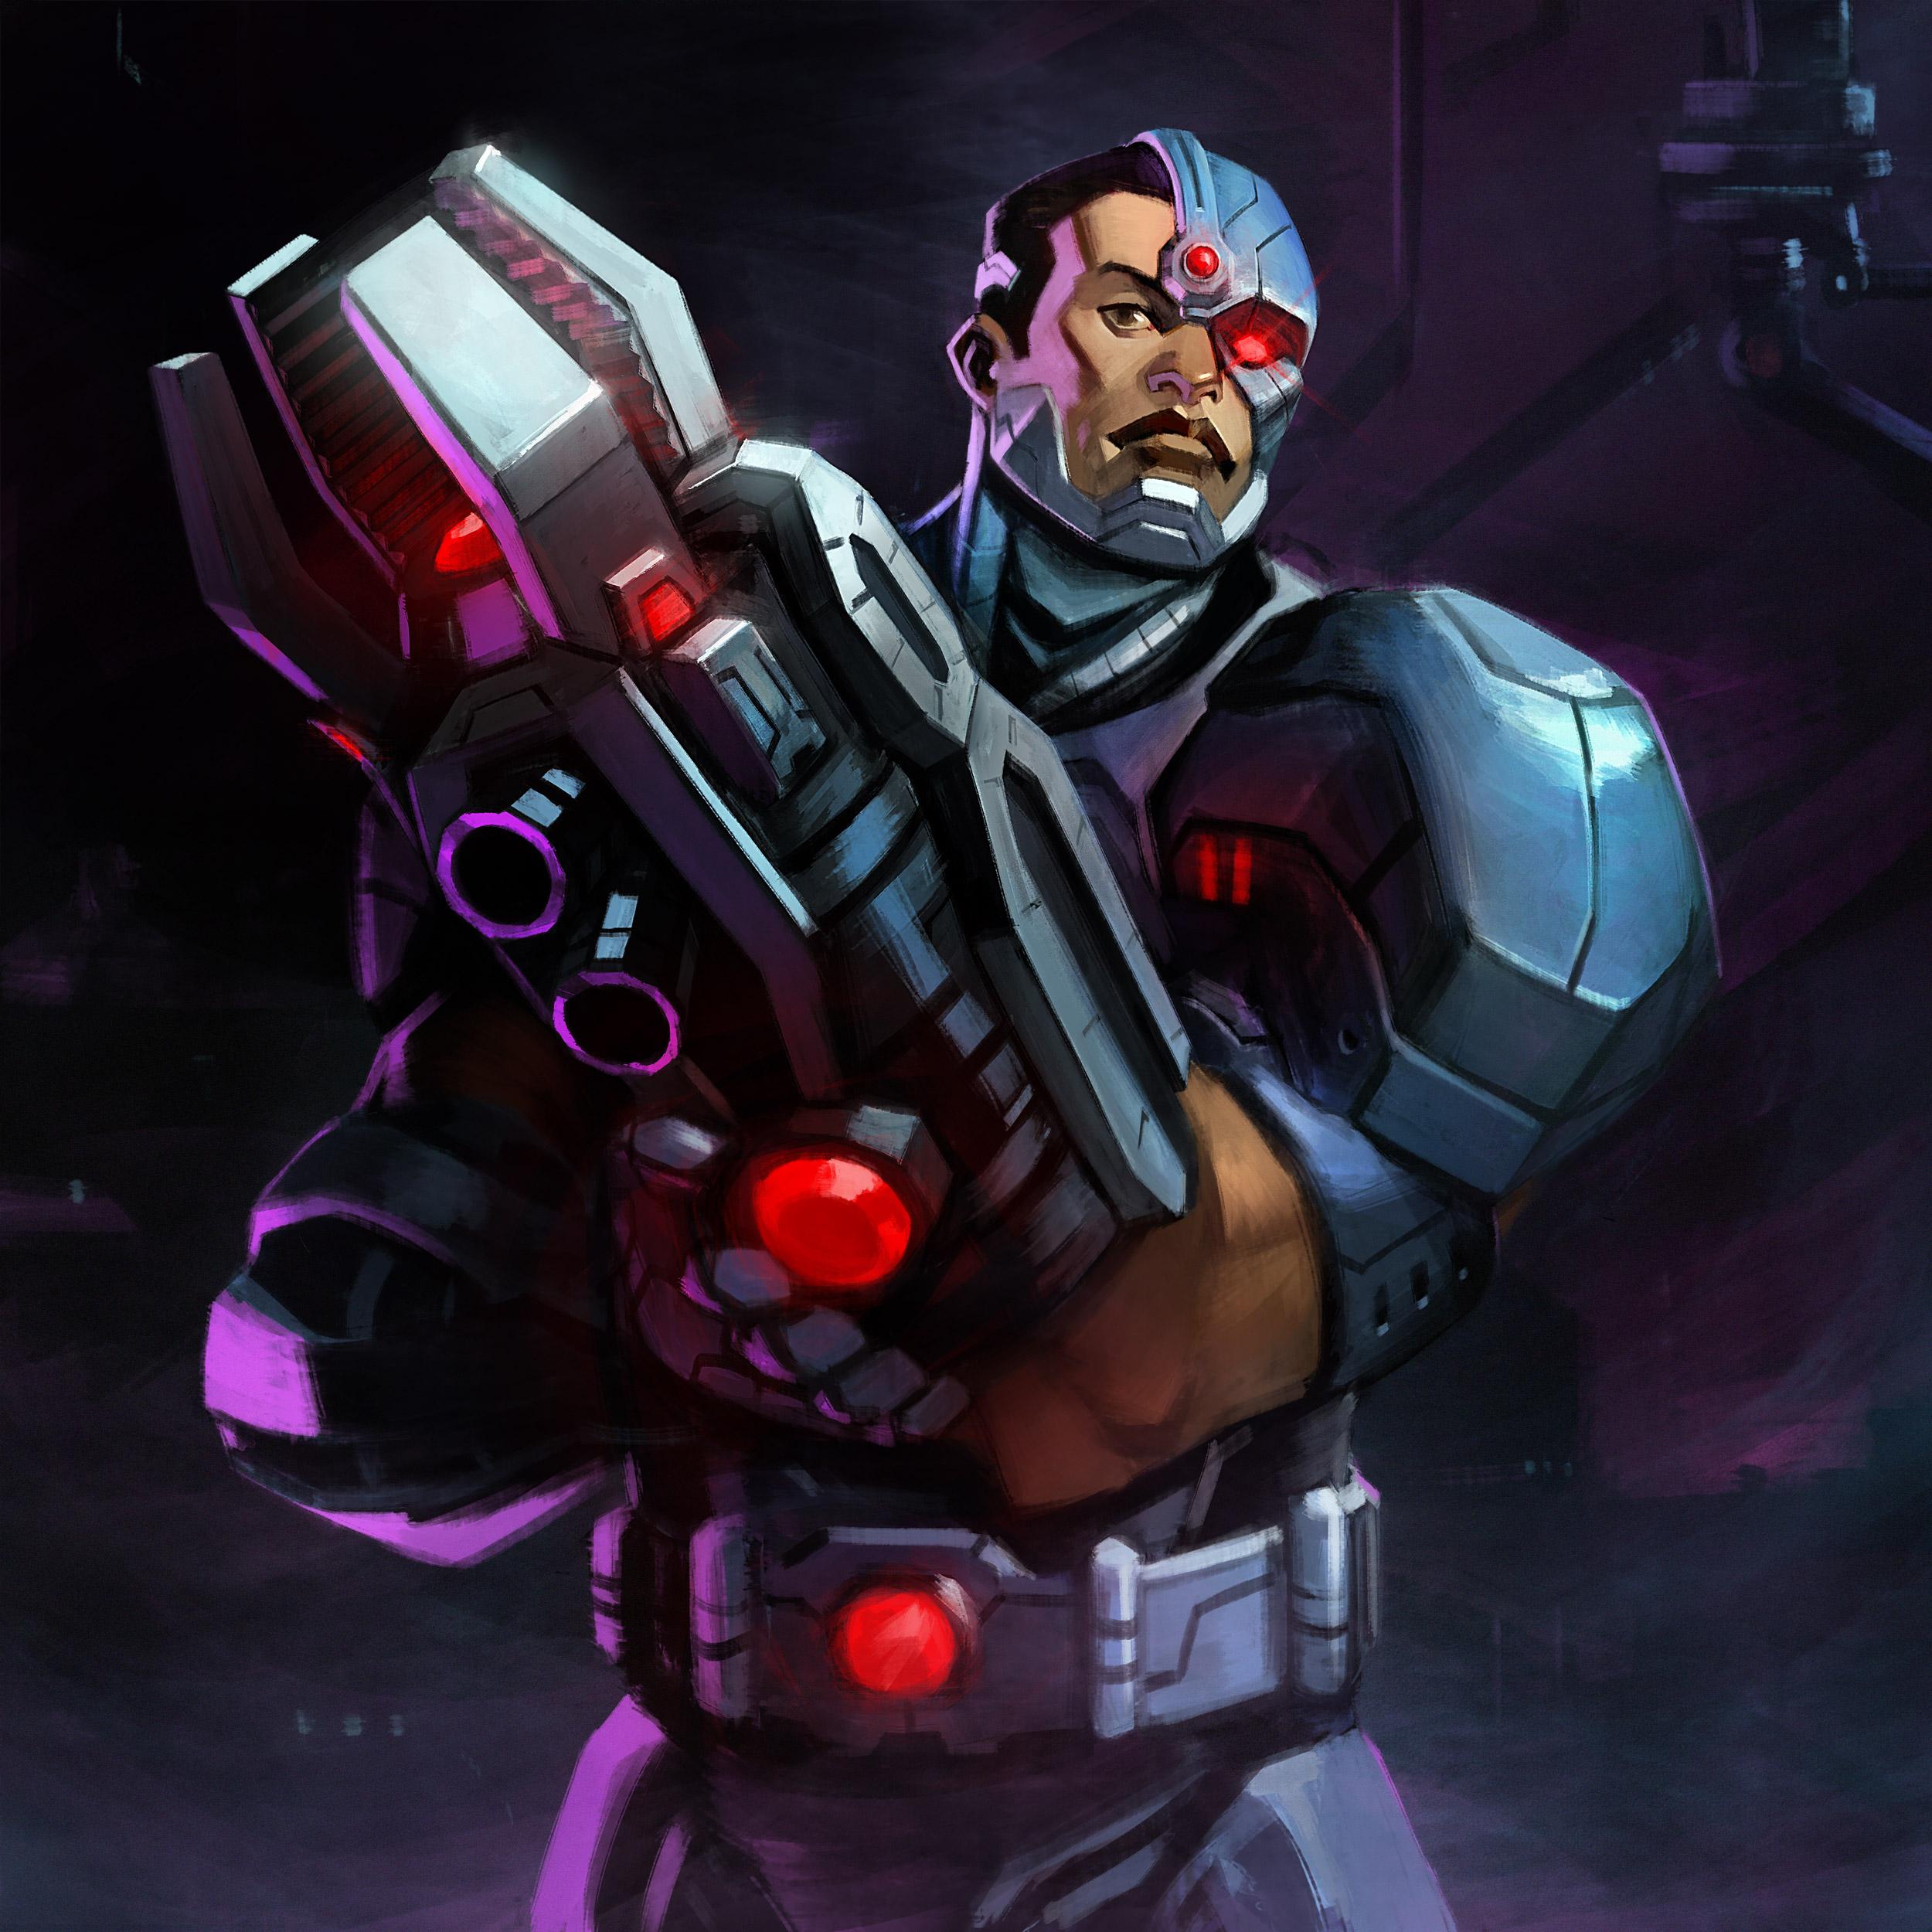 Infinite Crisis – Cyborg art